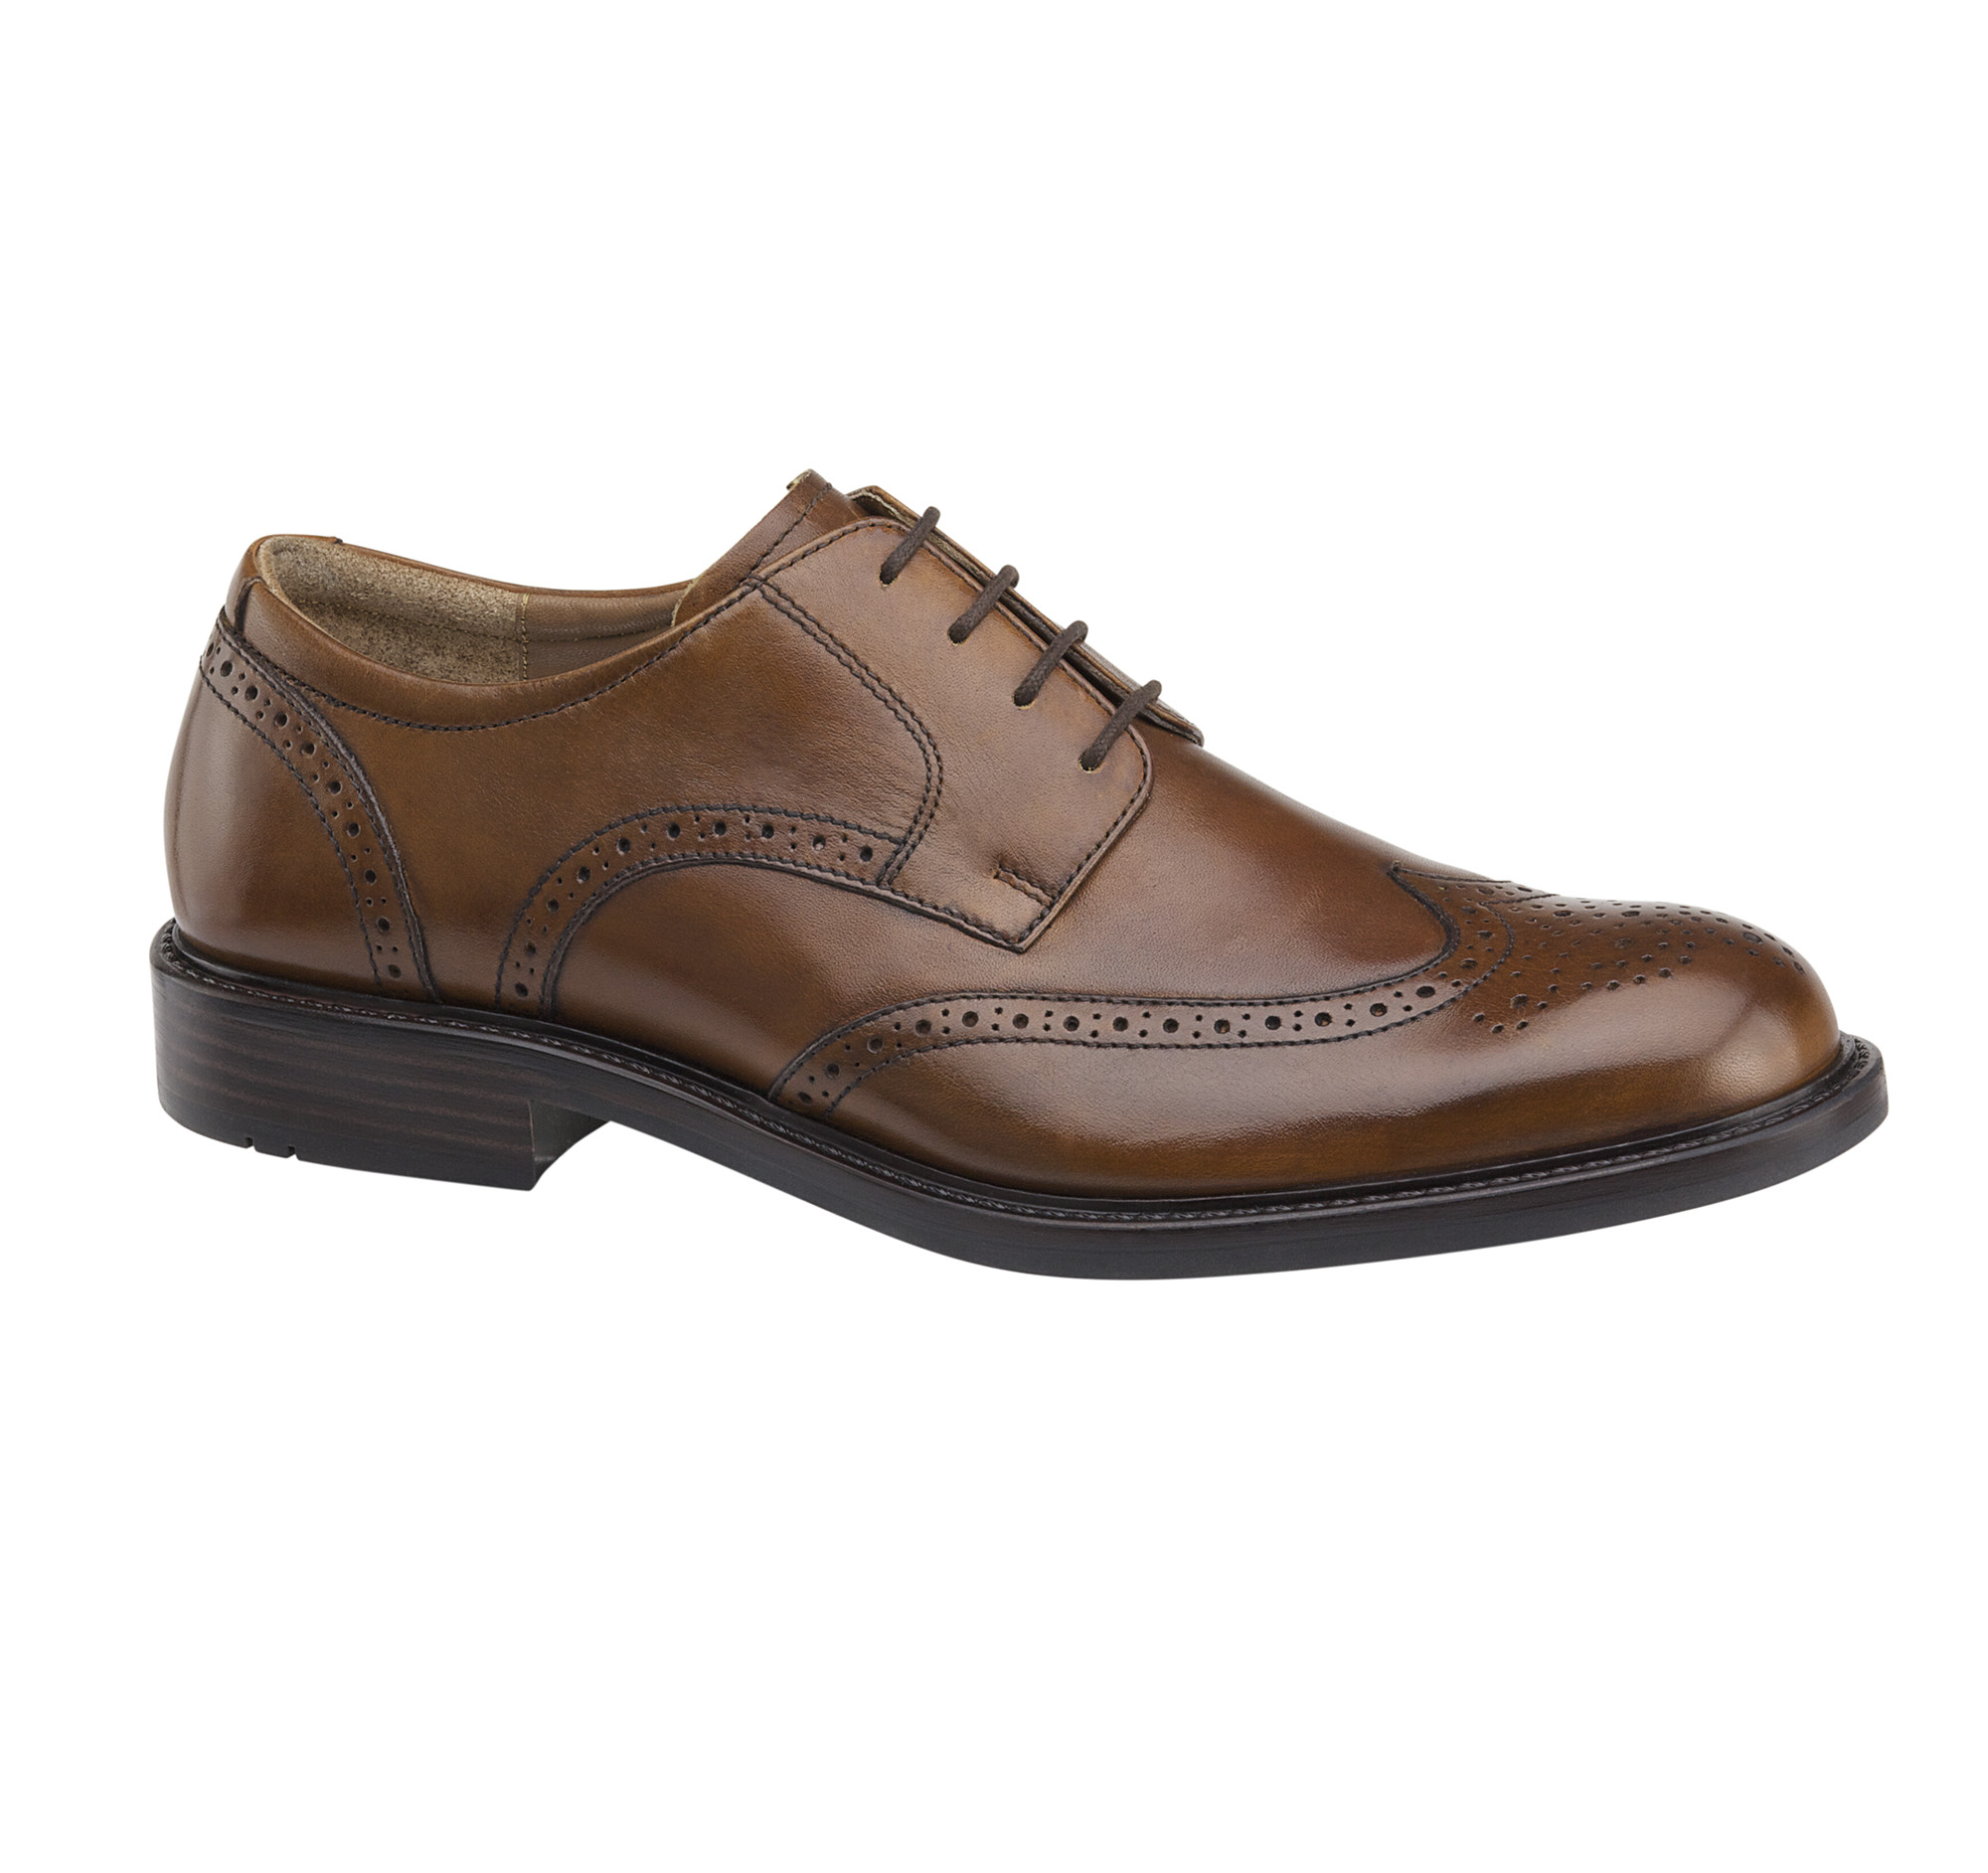 Johnston & Murphy Men's Tabor Wing Tip Oxfords Men's Shoes EYlWs5Xb